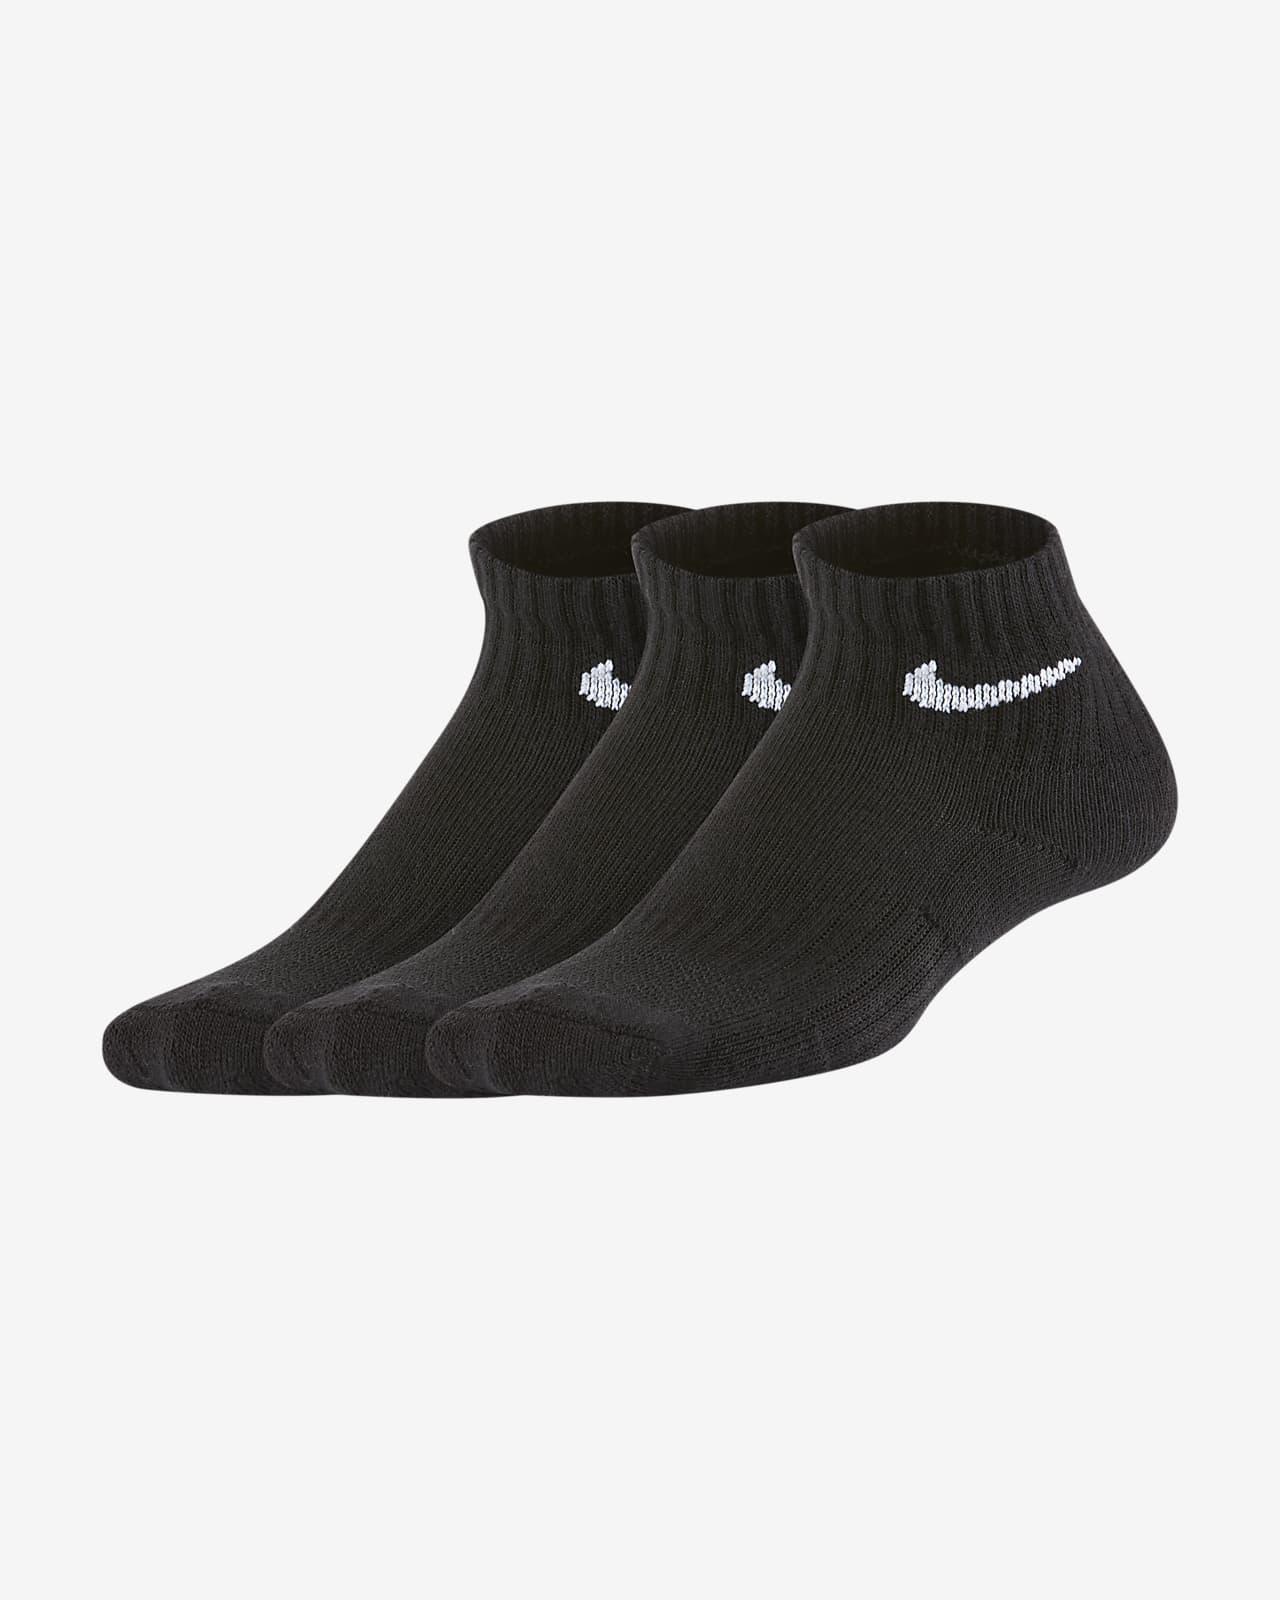 Nike Dri-FIT Little Kids' Ankle Socks (3 Pairs)